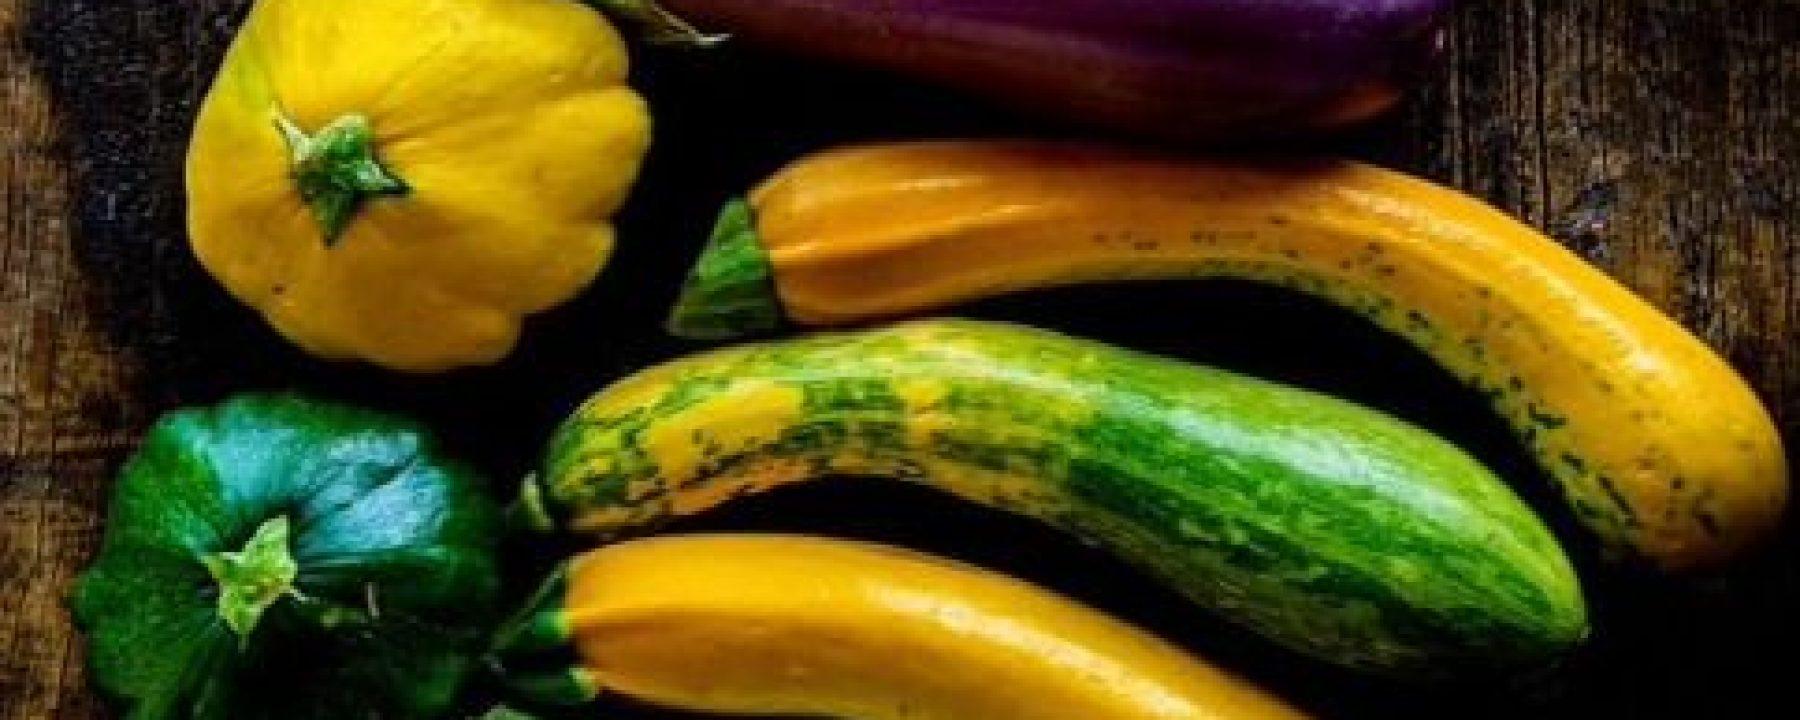 cropped-veggies.jpg